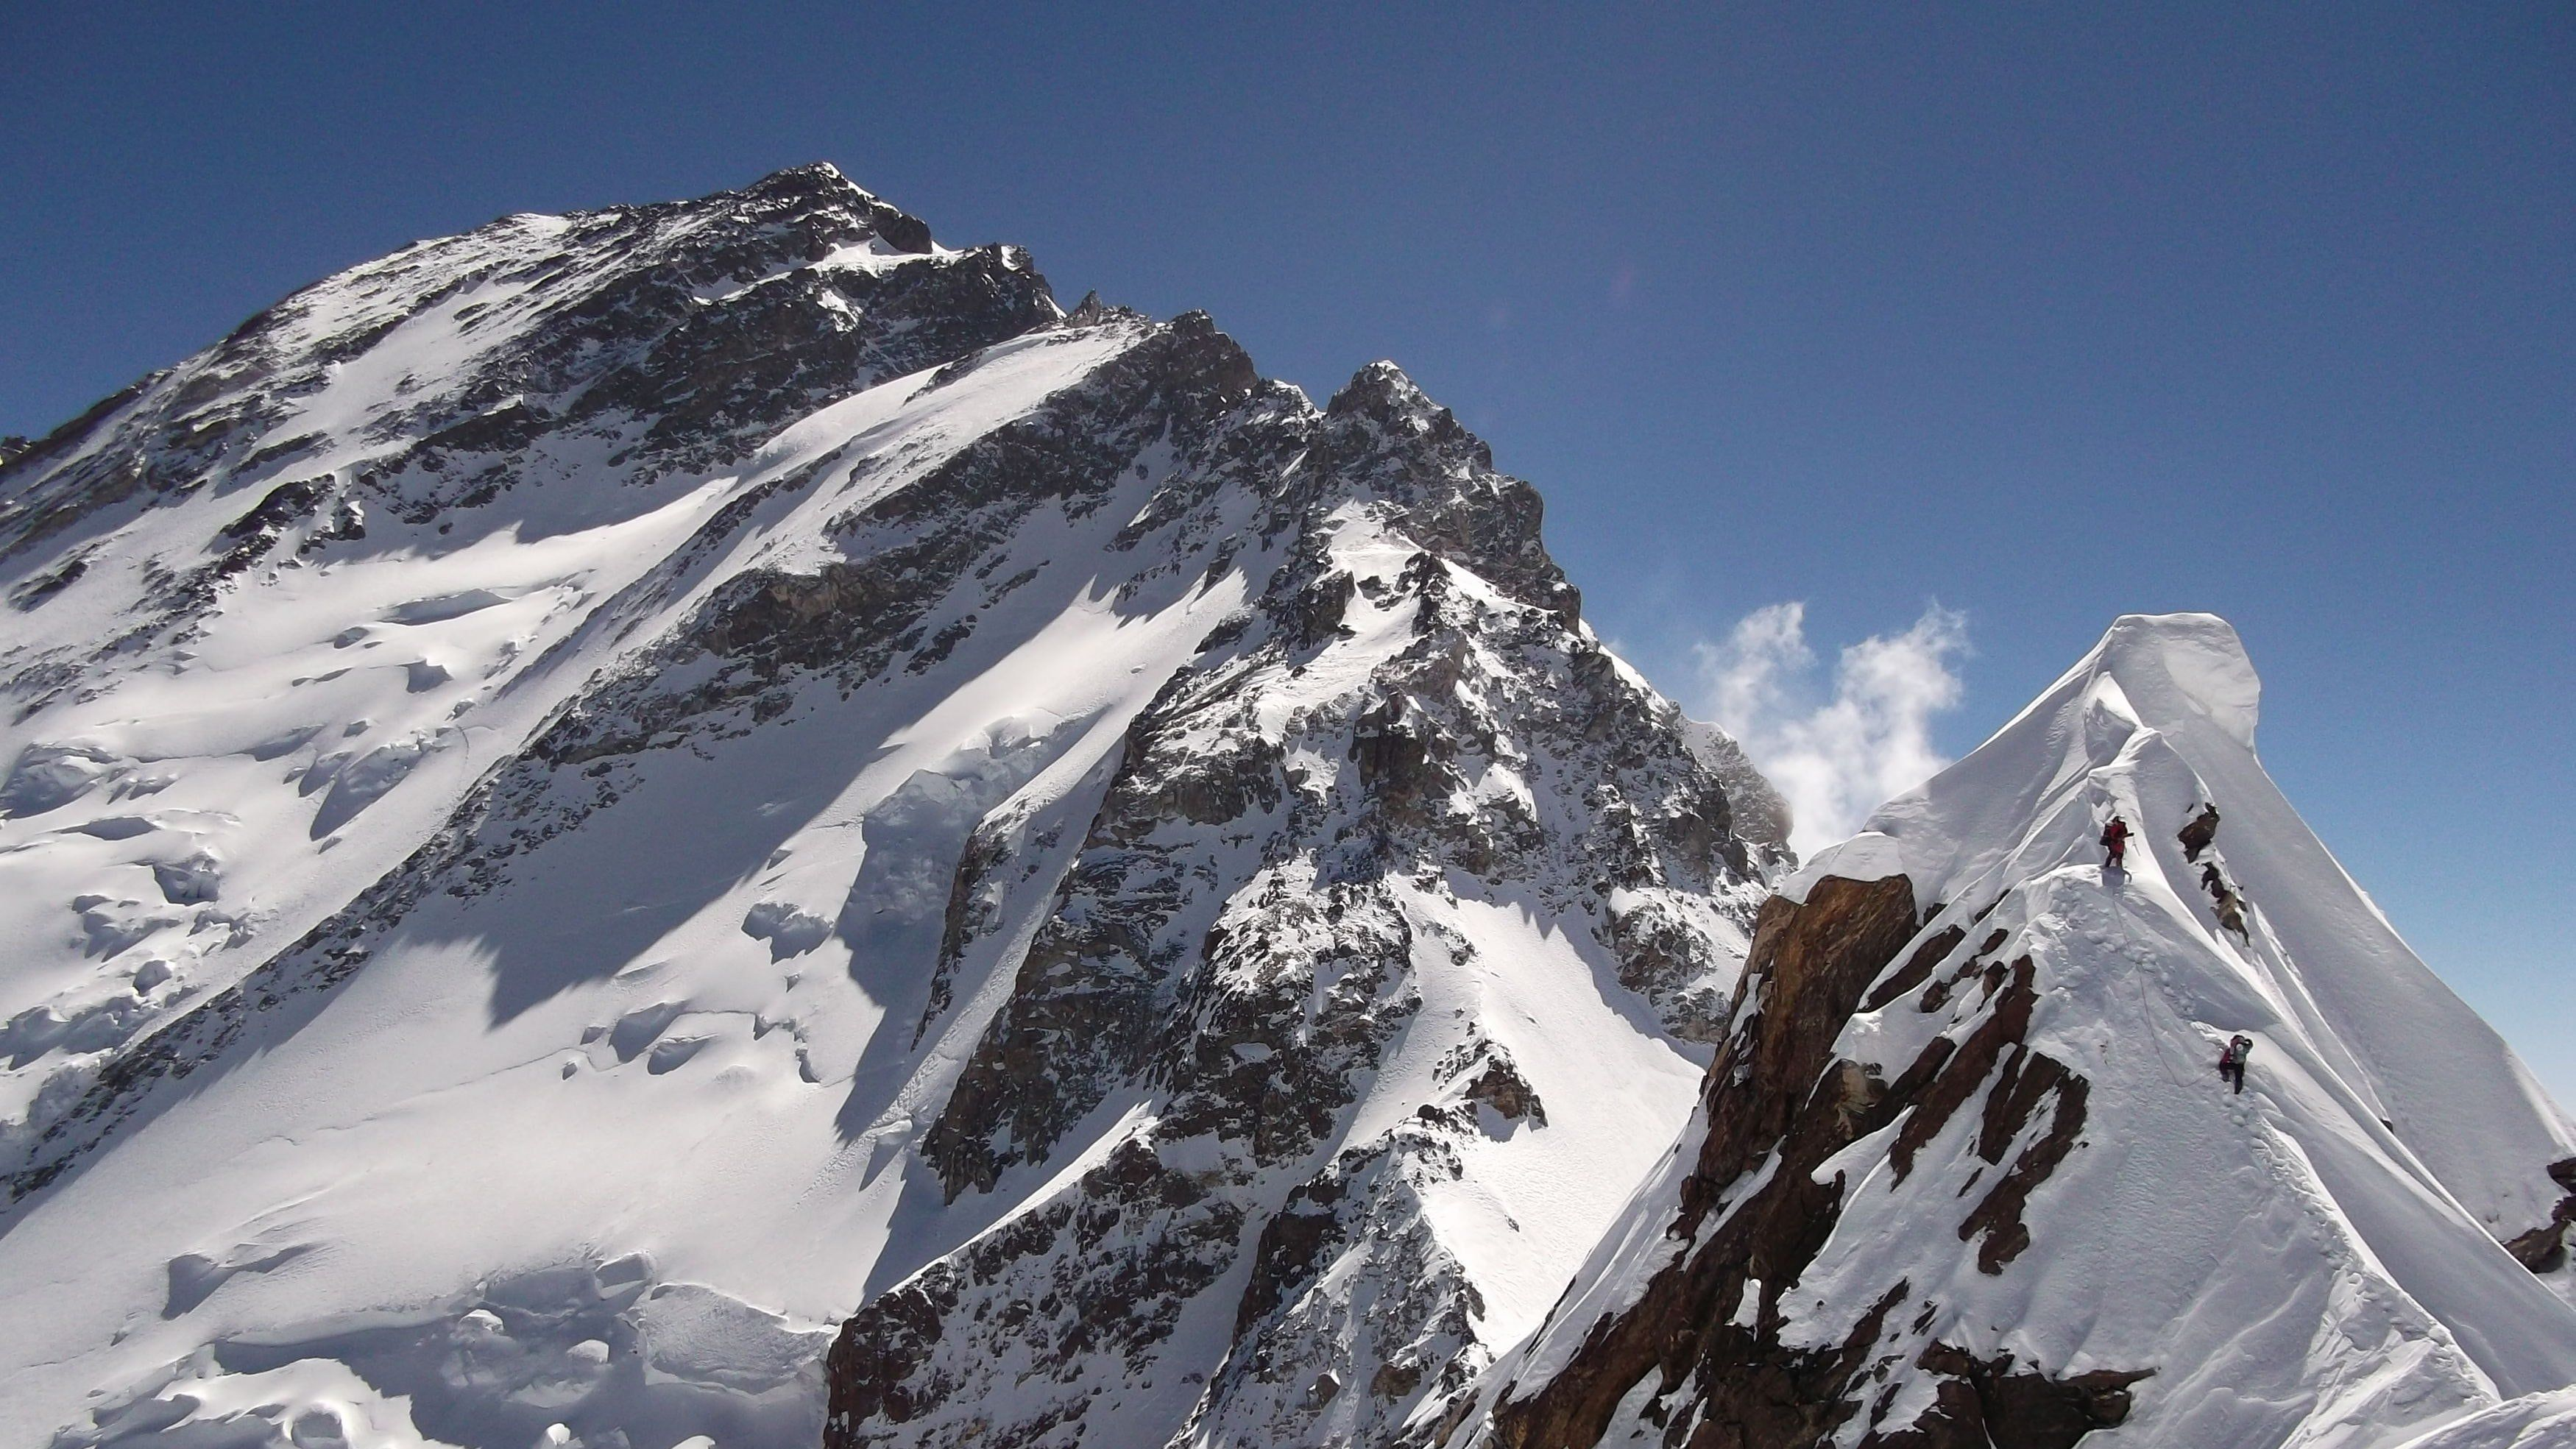 Missing climbers found dead on Pakistan's Nanga Parbat